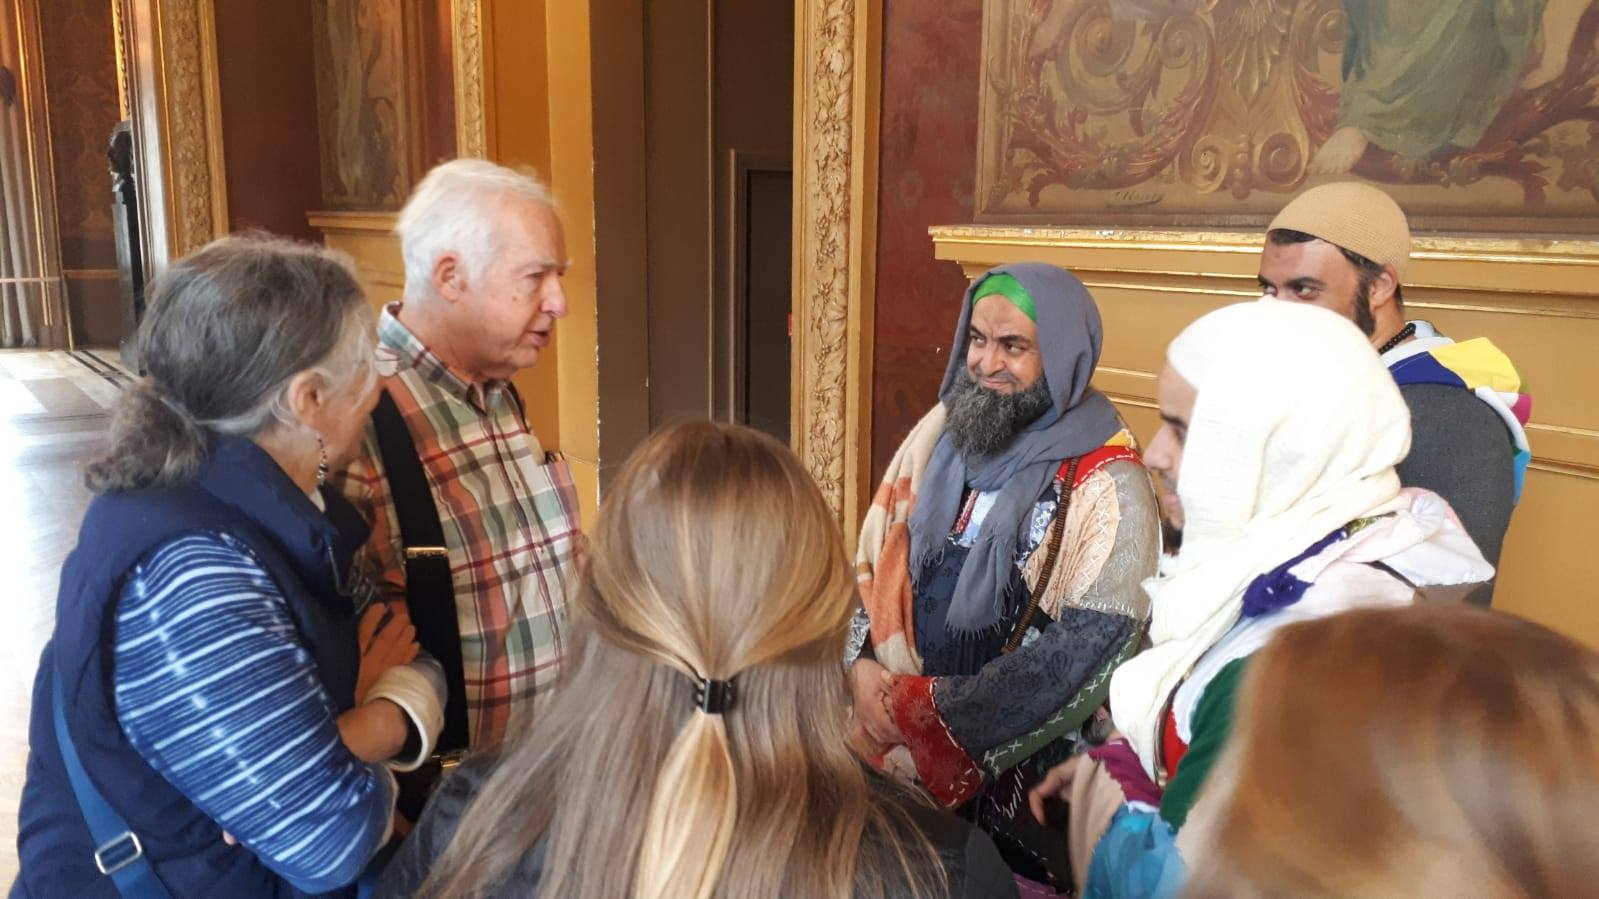 Sidi Shaykh à l'Opéra Garnier